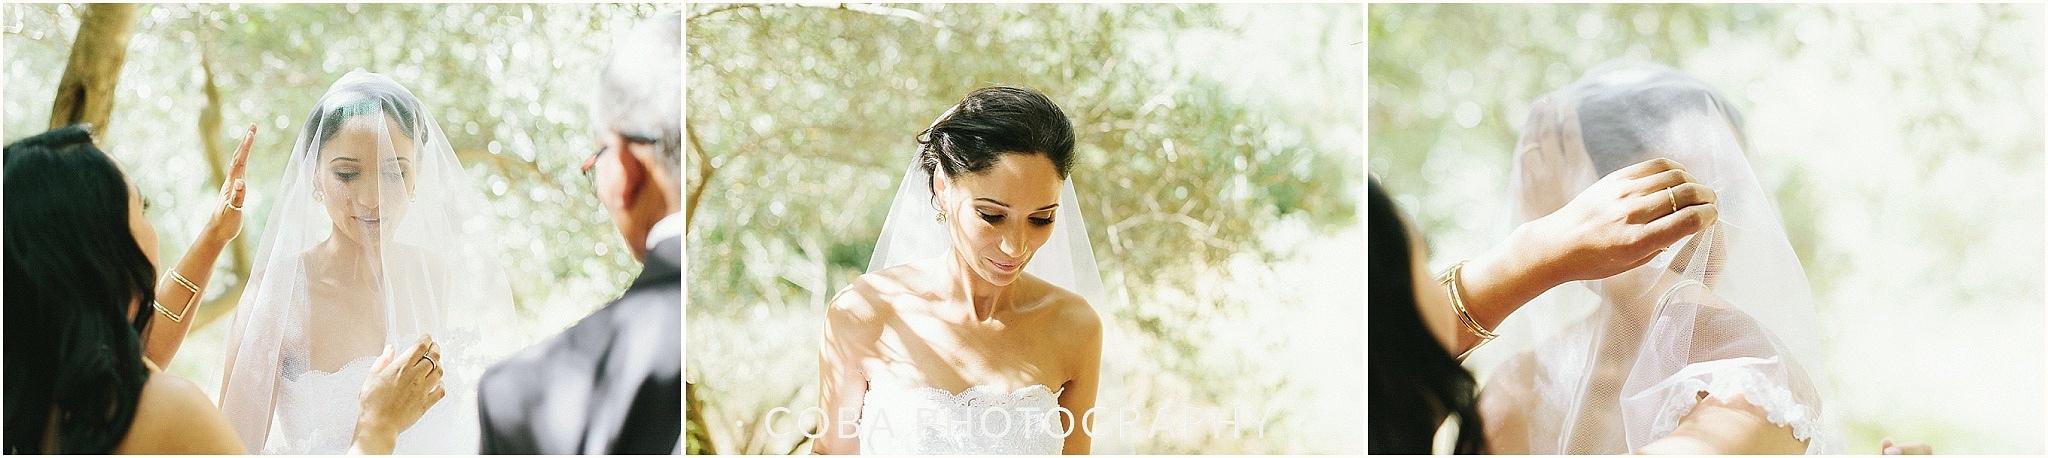 Marc&Melissa - Cascade Manor - Coba Photography (101)